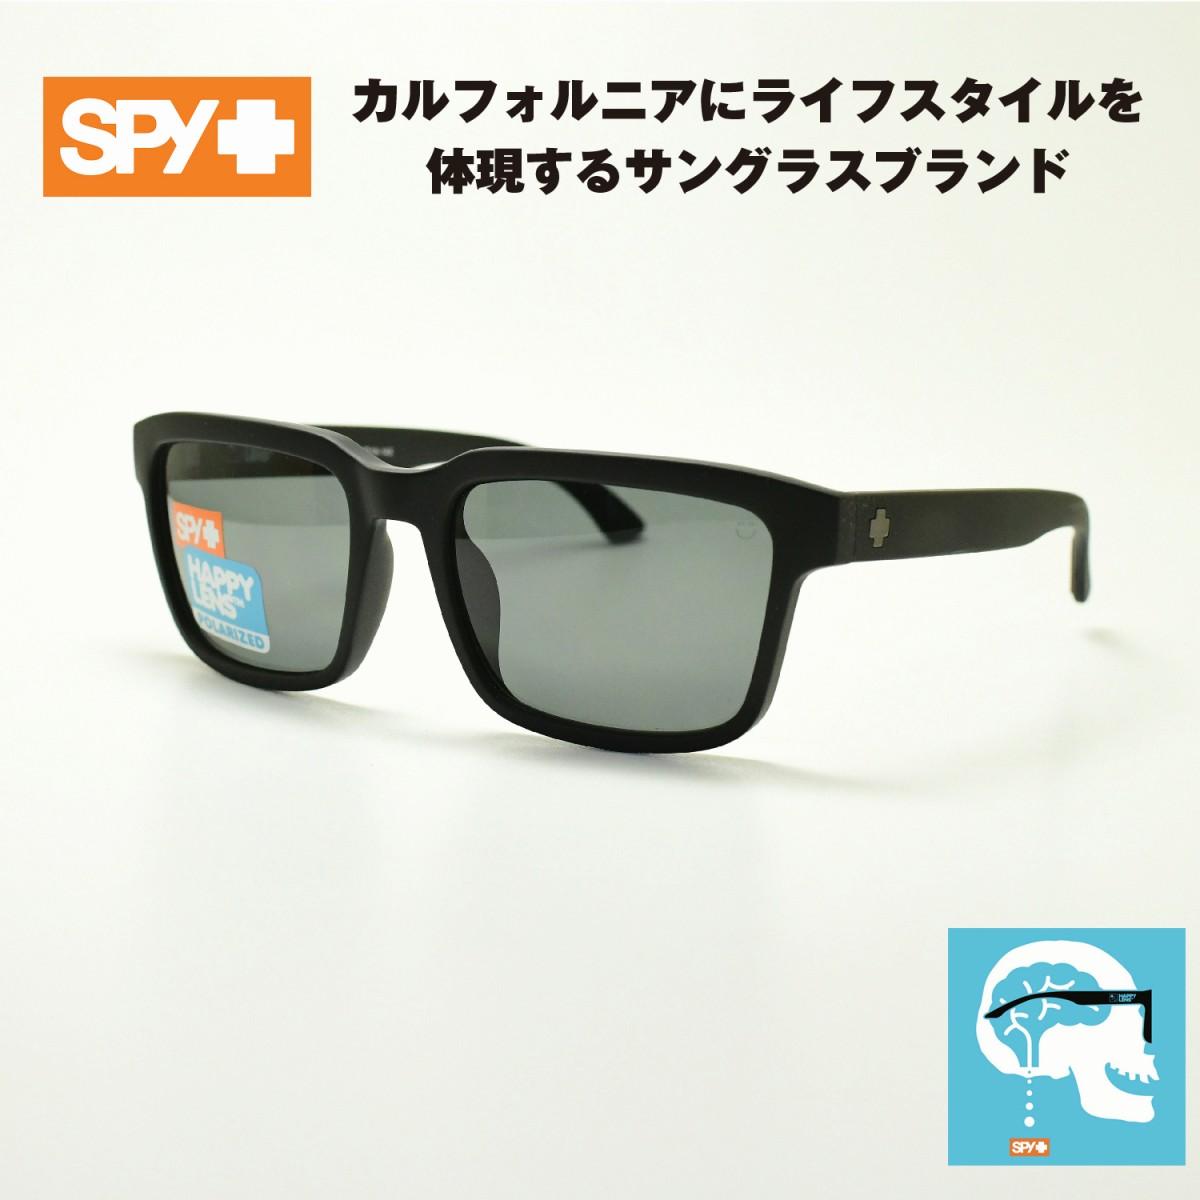 SPY スパイHELM2 ヘルム2(マットブラック/グレーグリーン偏光)